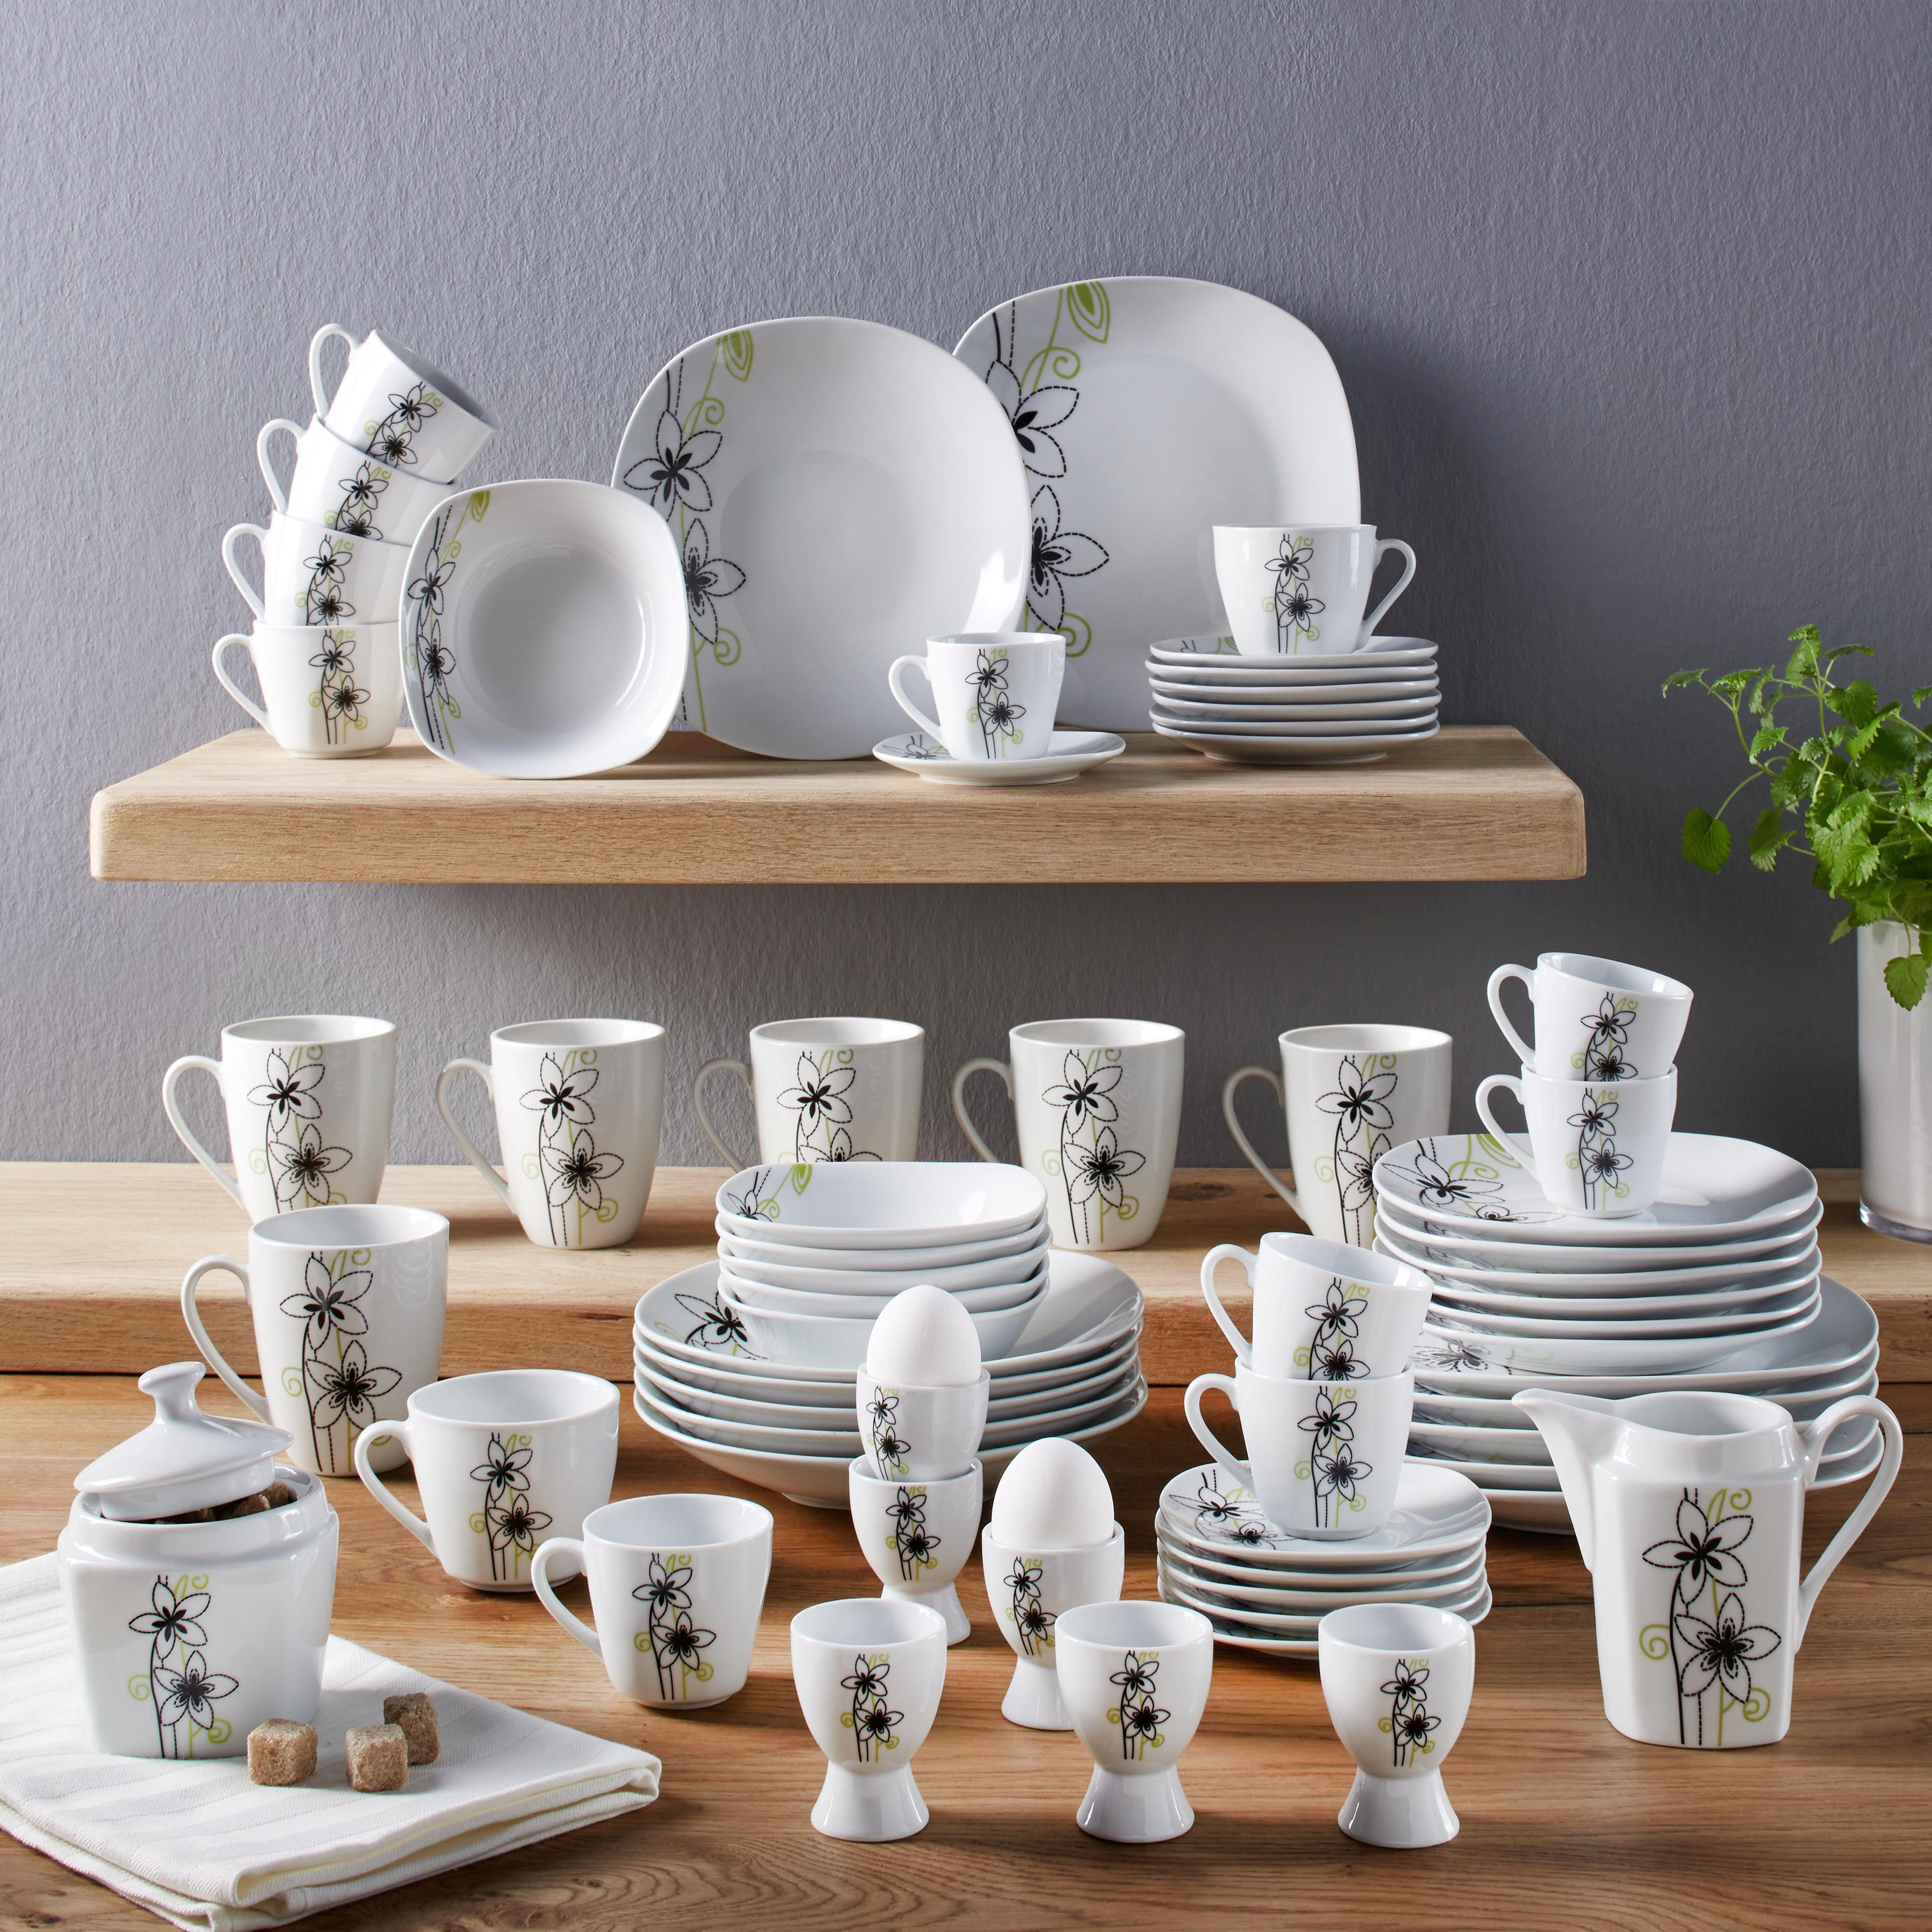 Kombinirani Servis Leonie -top- - črna/bela, Konvencionalno, keramika - MÖMAX modern living